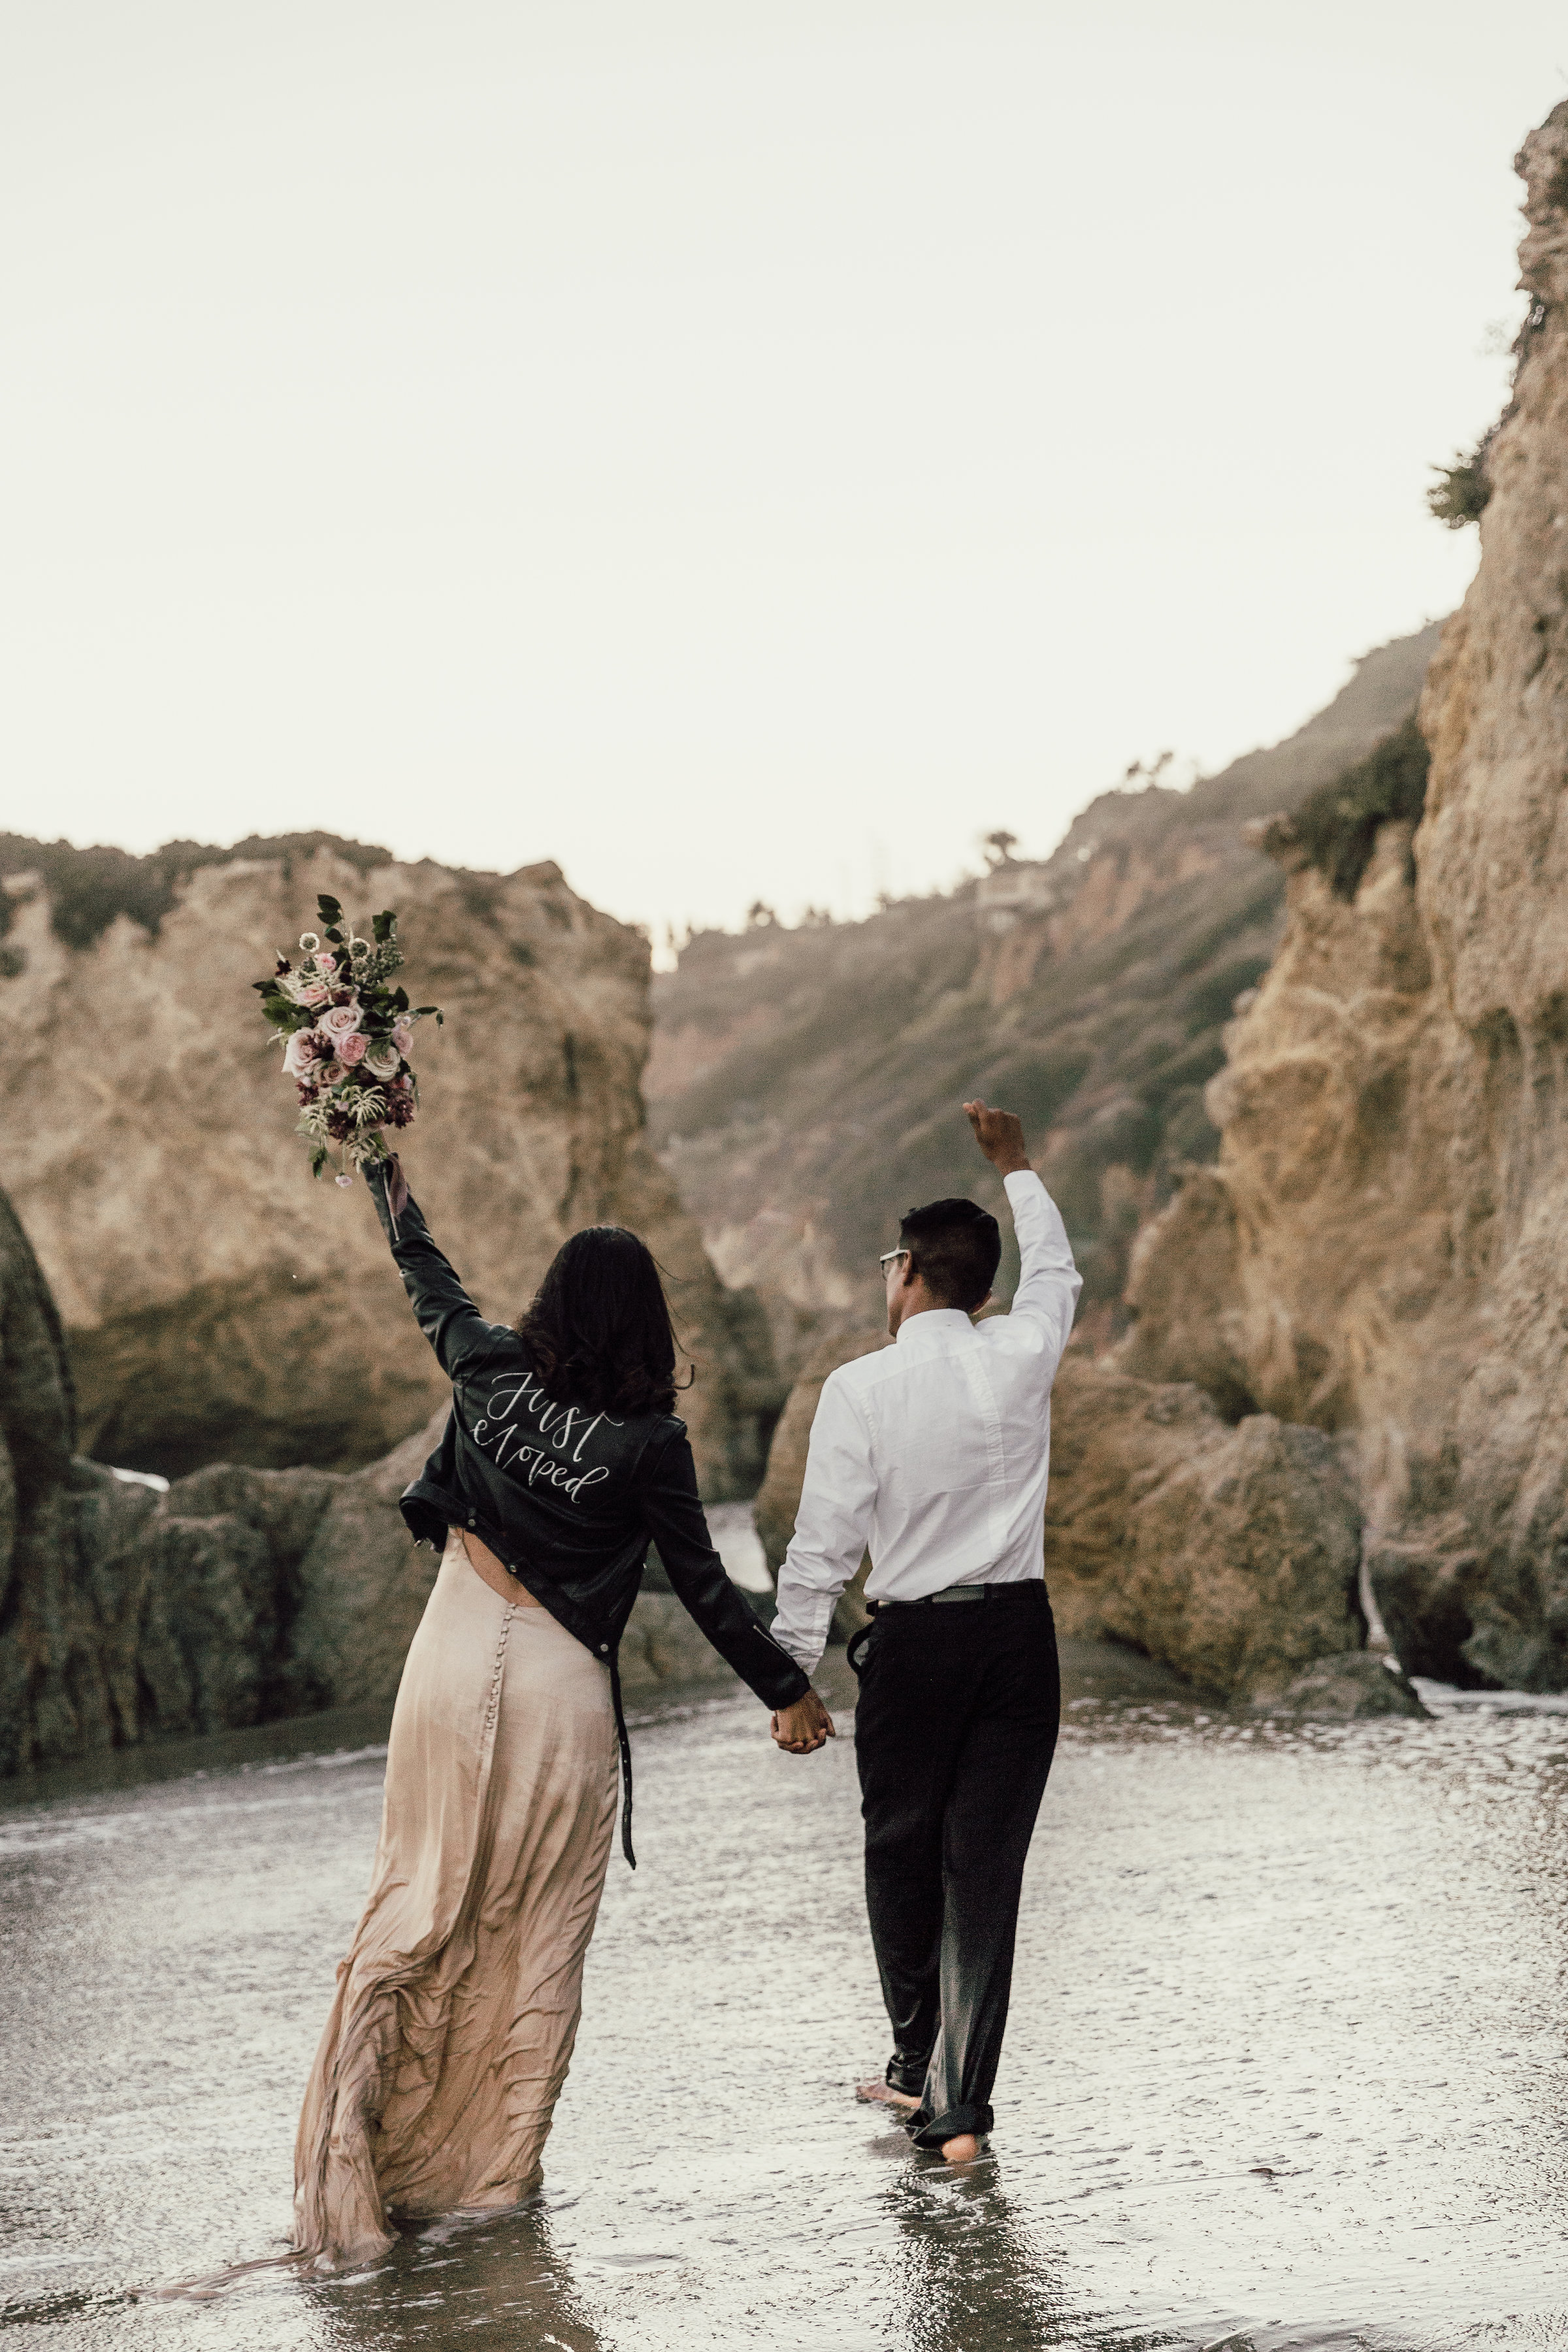 Textured_Garden_Style_Florals_Sibyl_Sophia_Just_Married.jpg